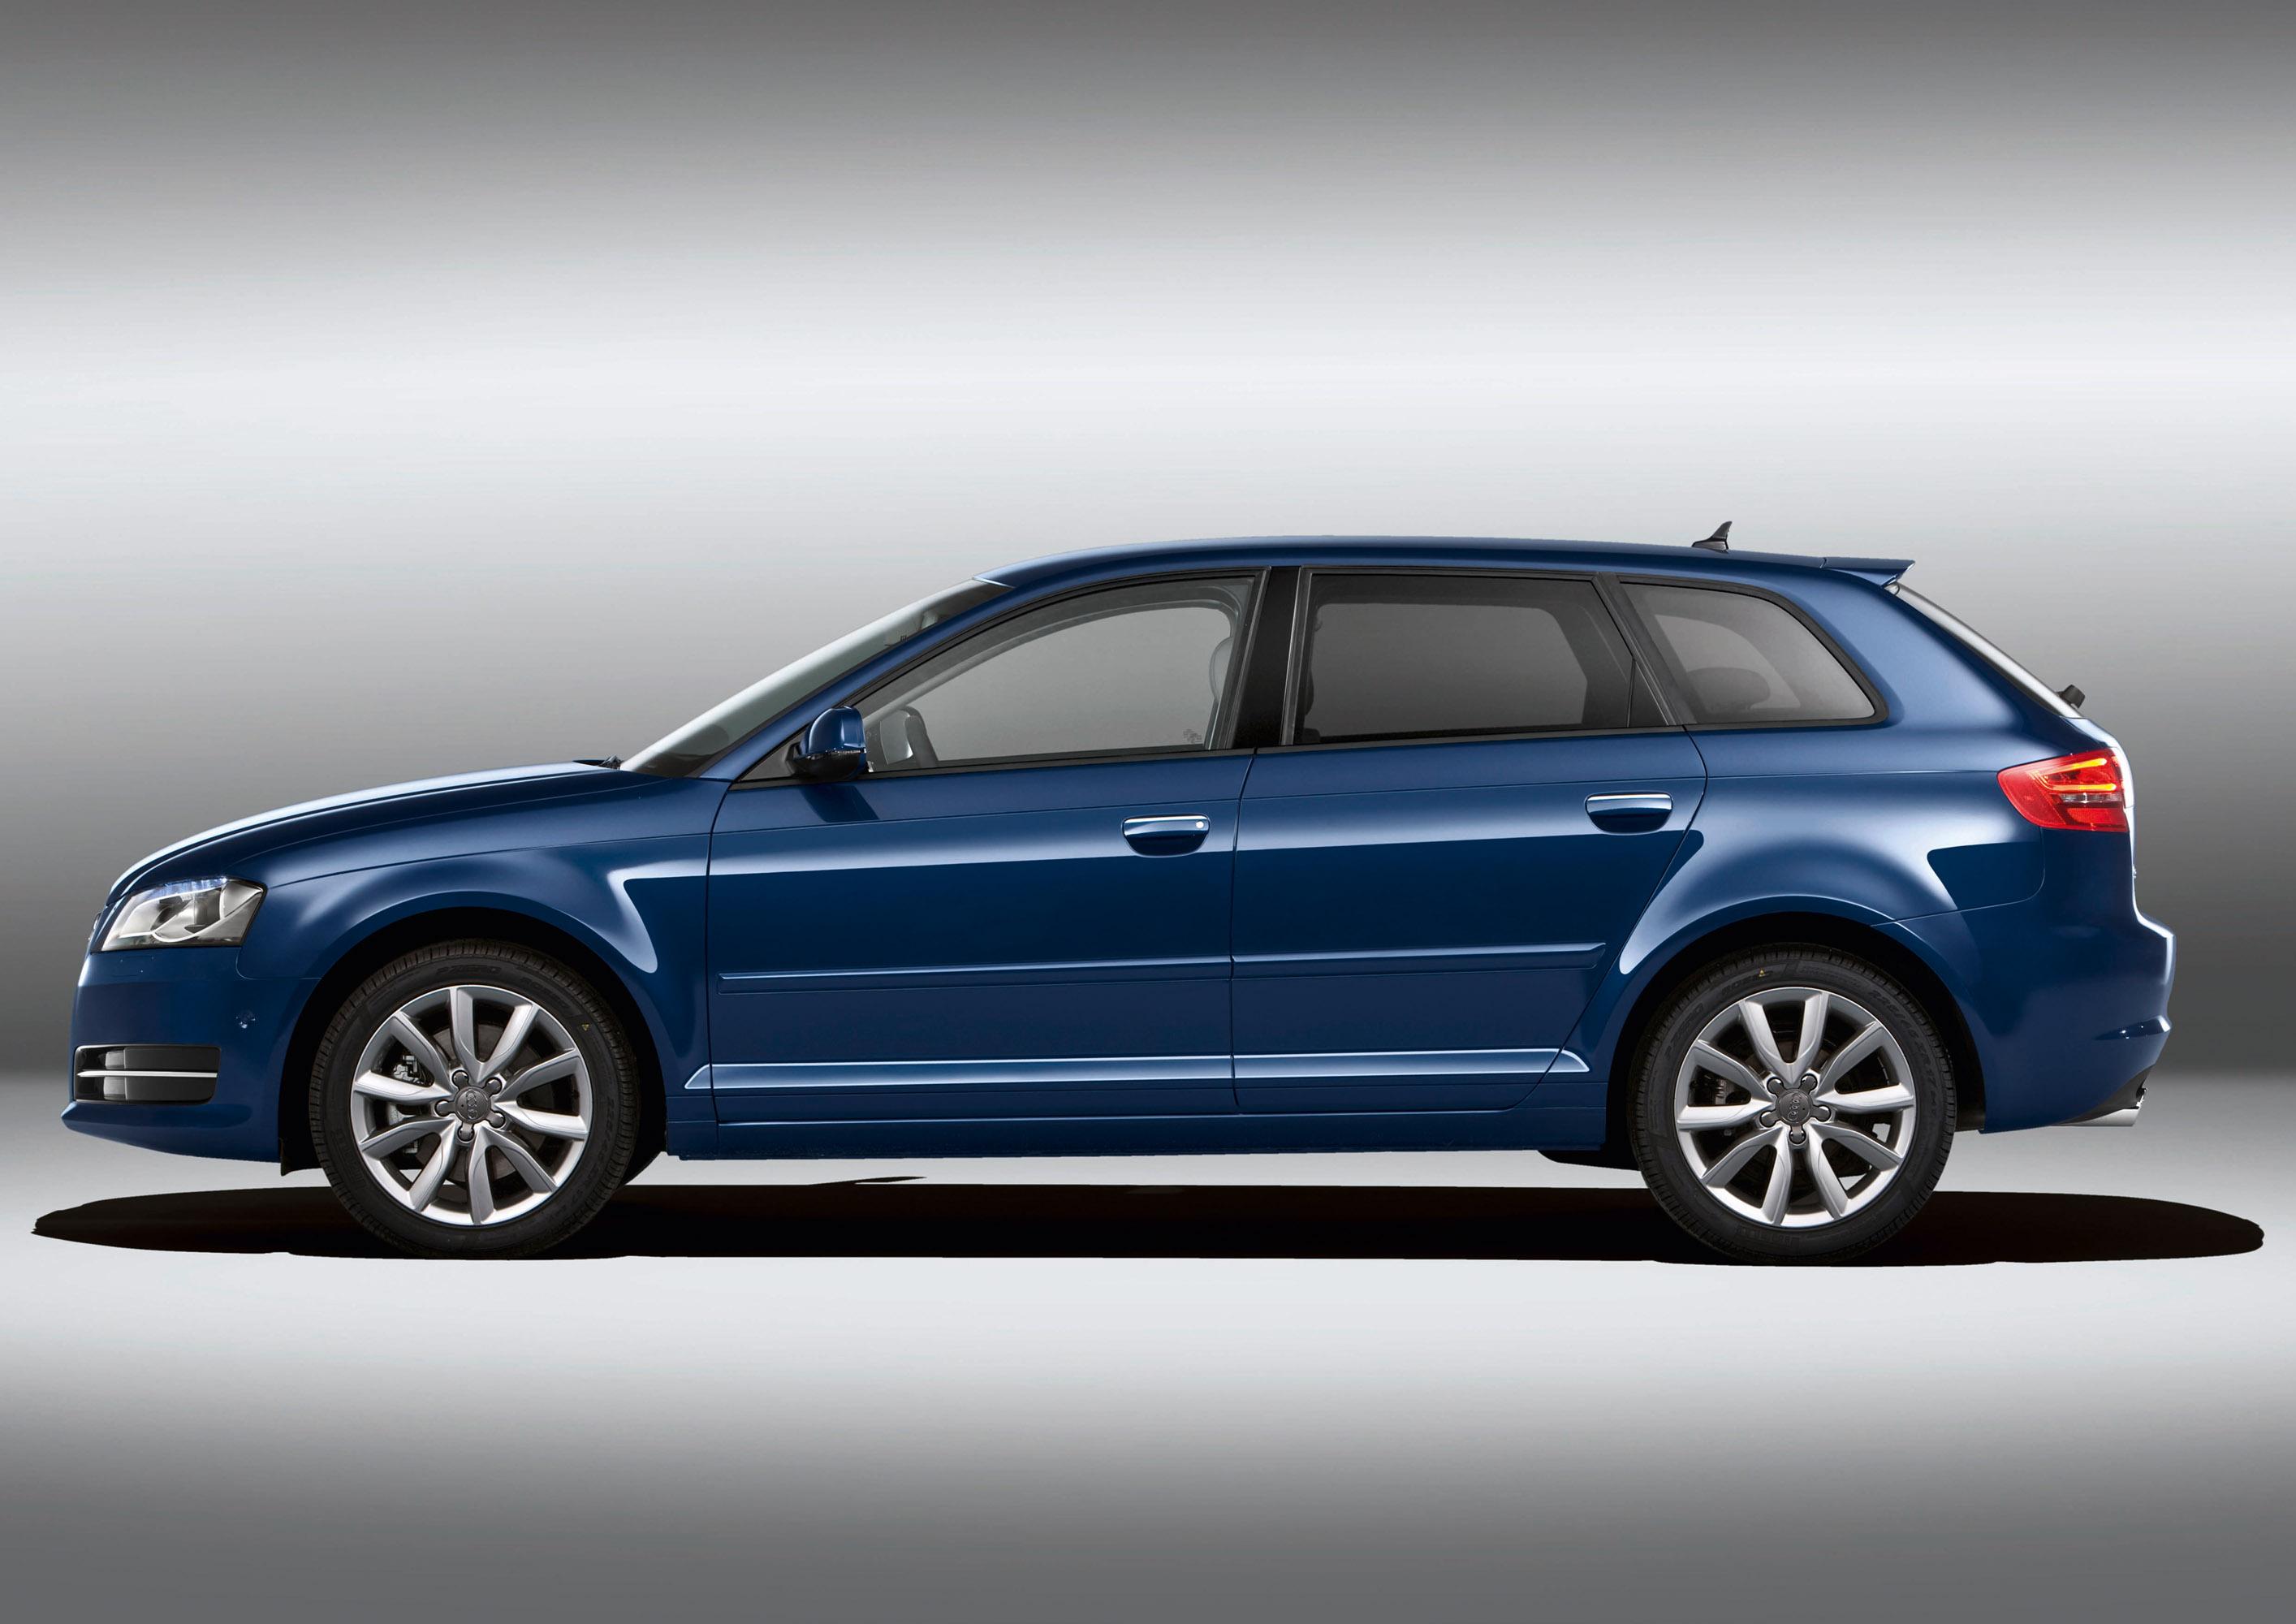 2013 Audi A3 Sportback Picture 74596